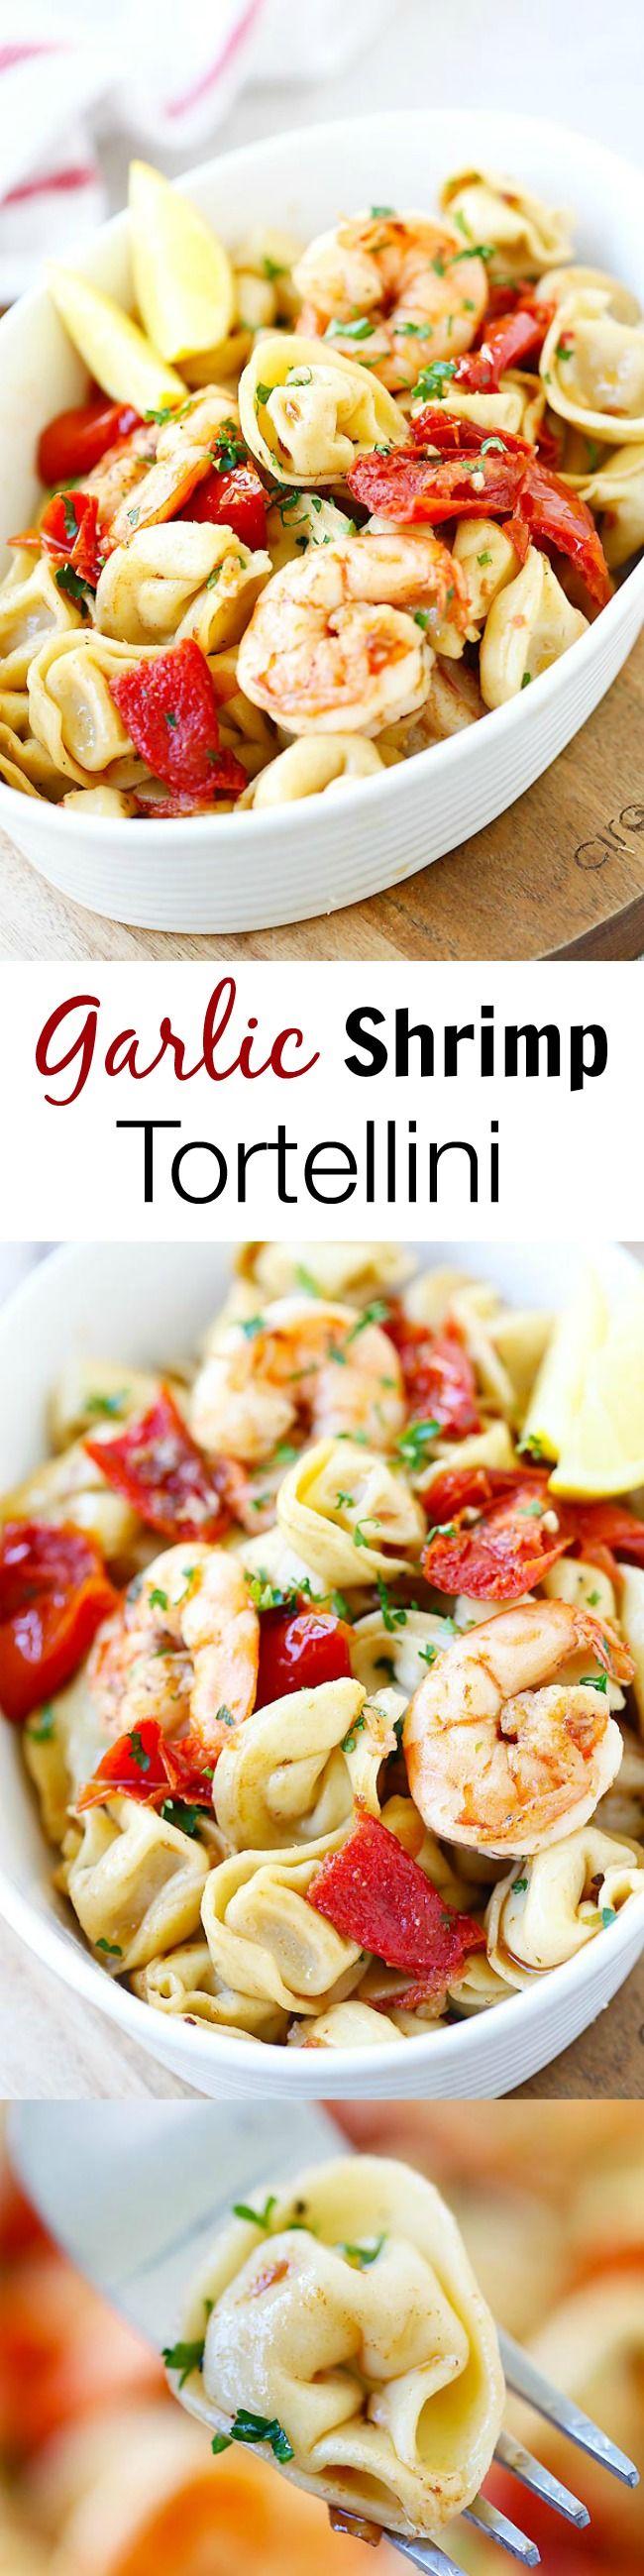 Garlic Shrimp Tortellini – AMAZING tortellini with garlic shrimp. Super easy recipe, takes 20 minutes, so delicious and better than restaurant's   rasamalaysia.com